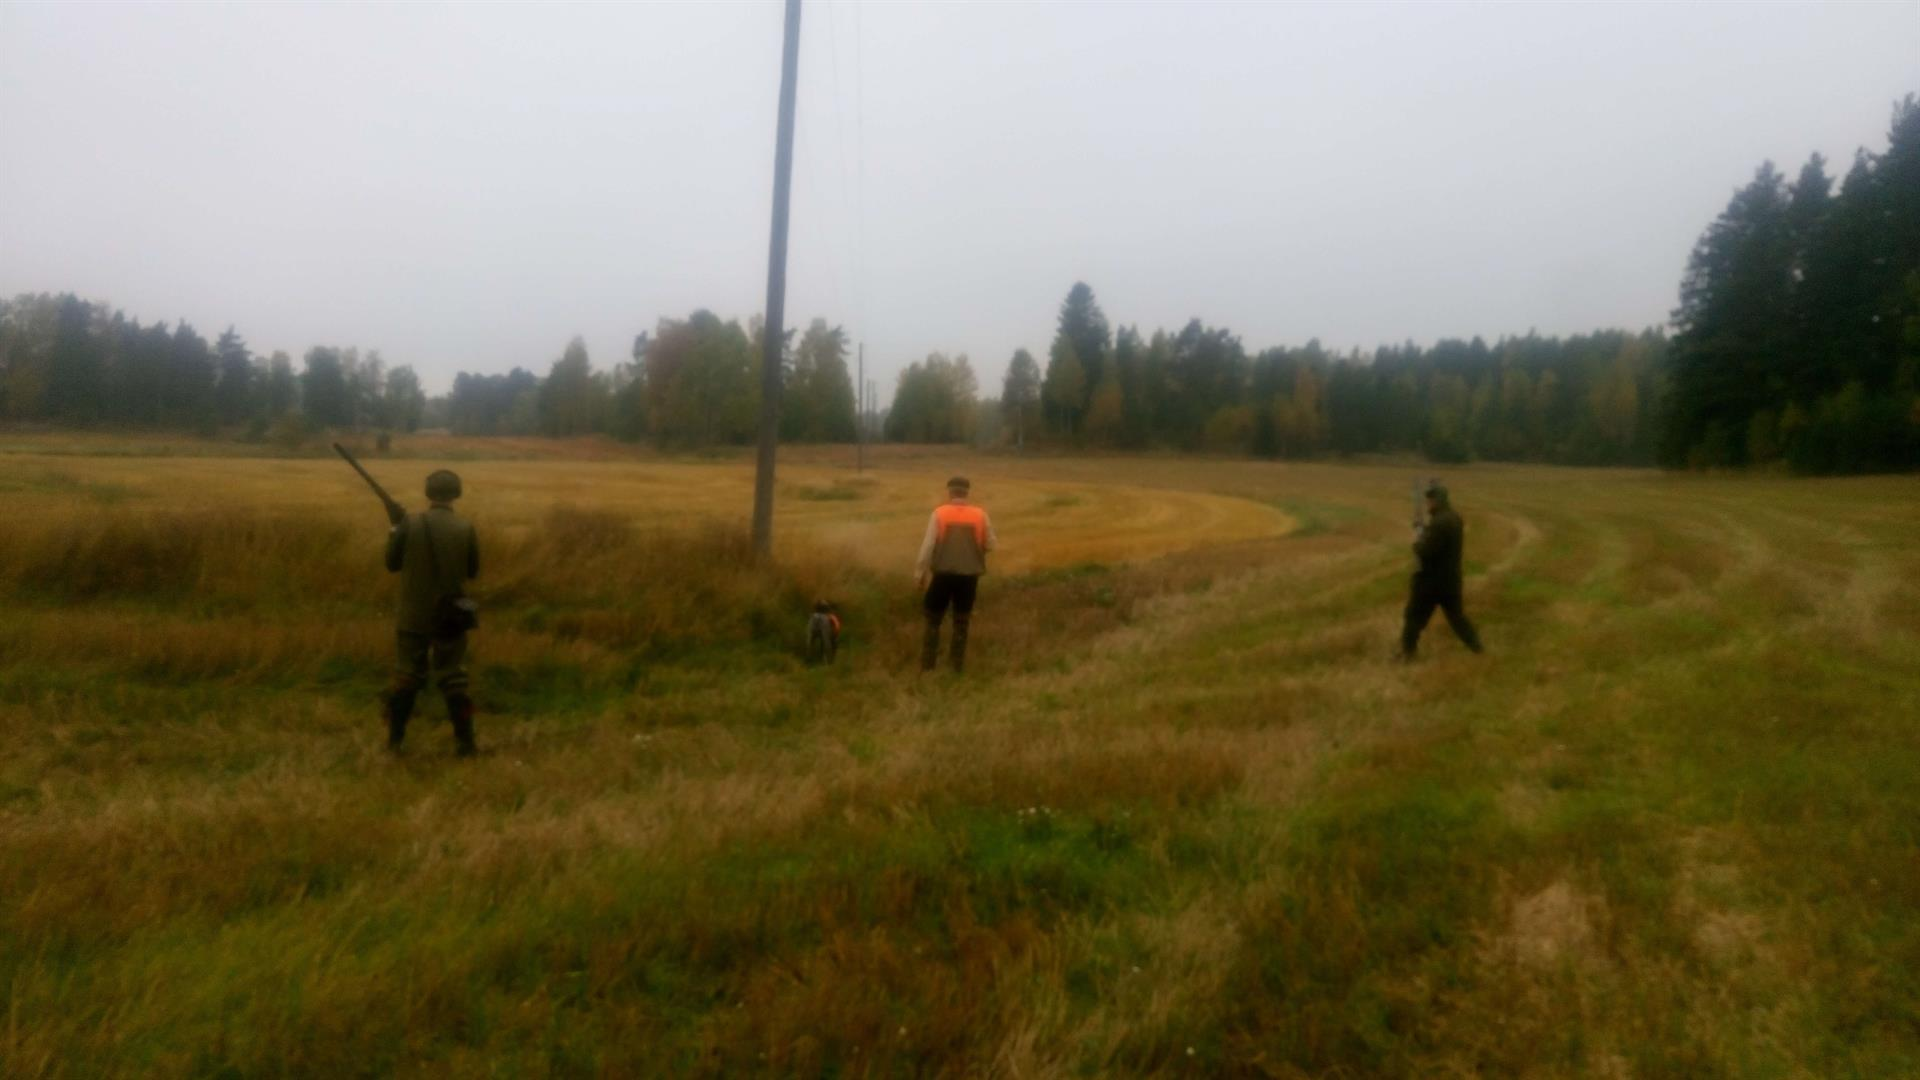 Peltopyyjahtia Norrby Gårdissa